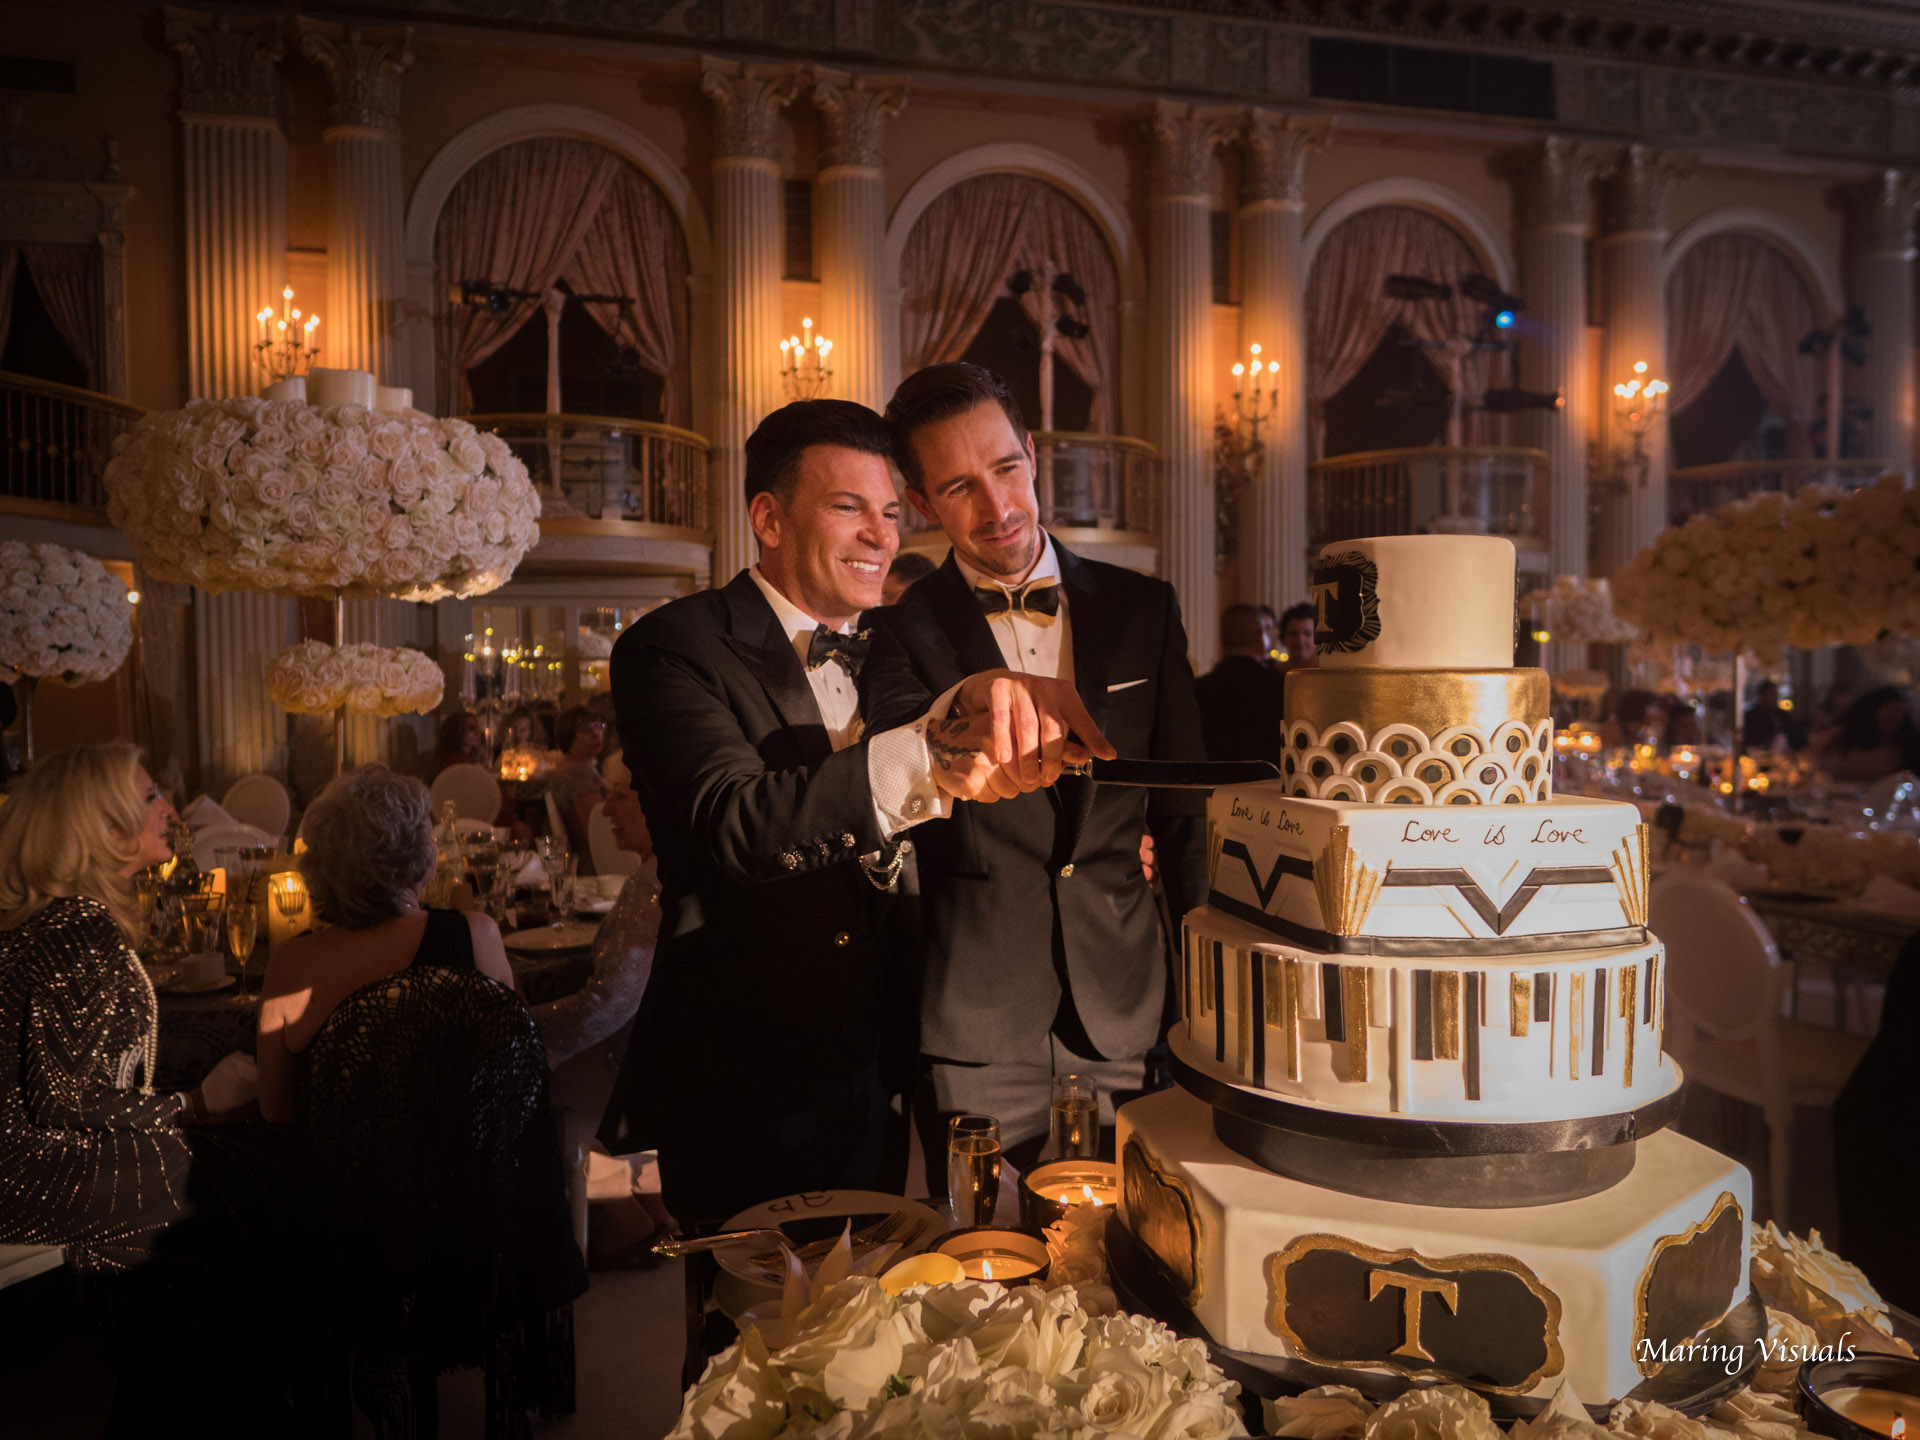 David Tutera Weddings by Maring Visuals 00575.jpg